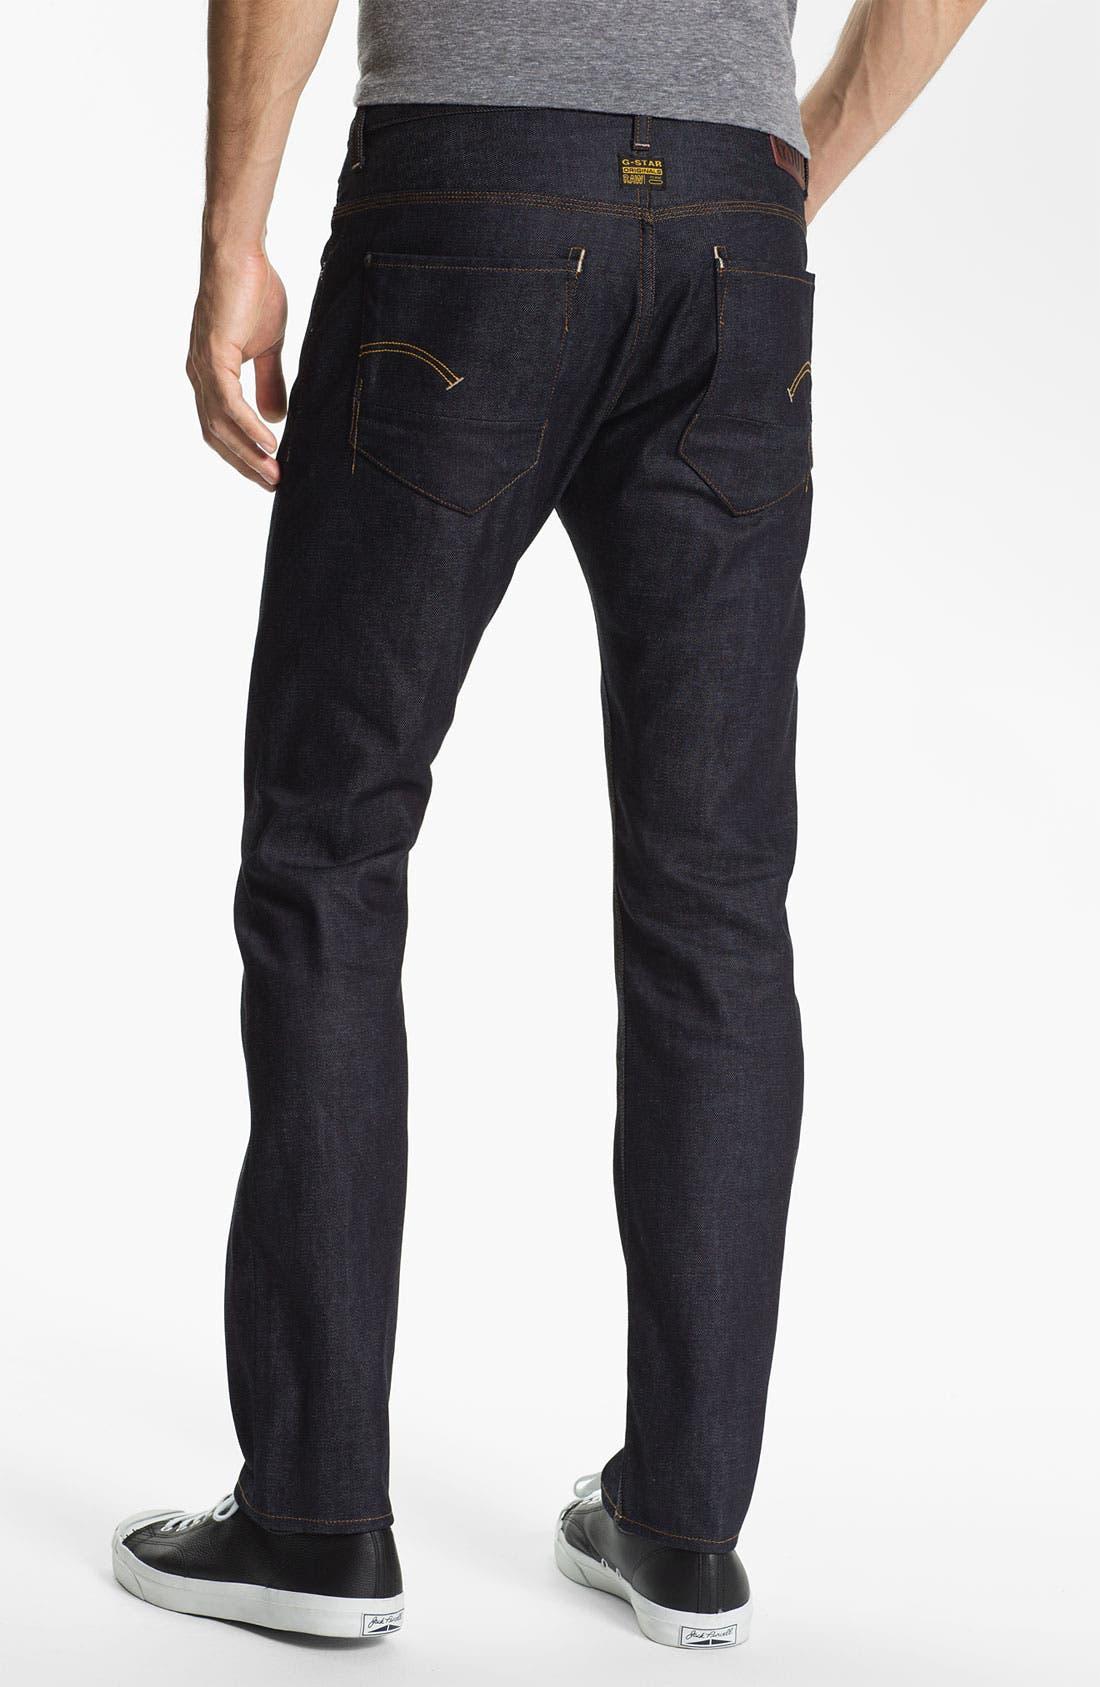 Main Image - G-Star Raw 'New Radar' Slim Straight Leg Jeans (Rigid Raw)